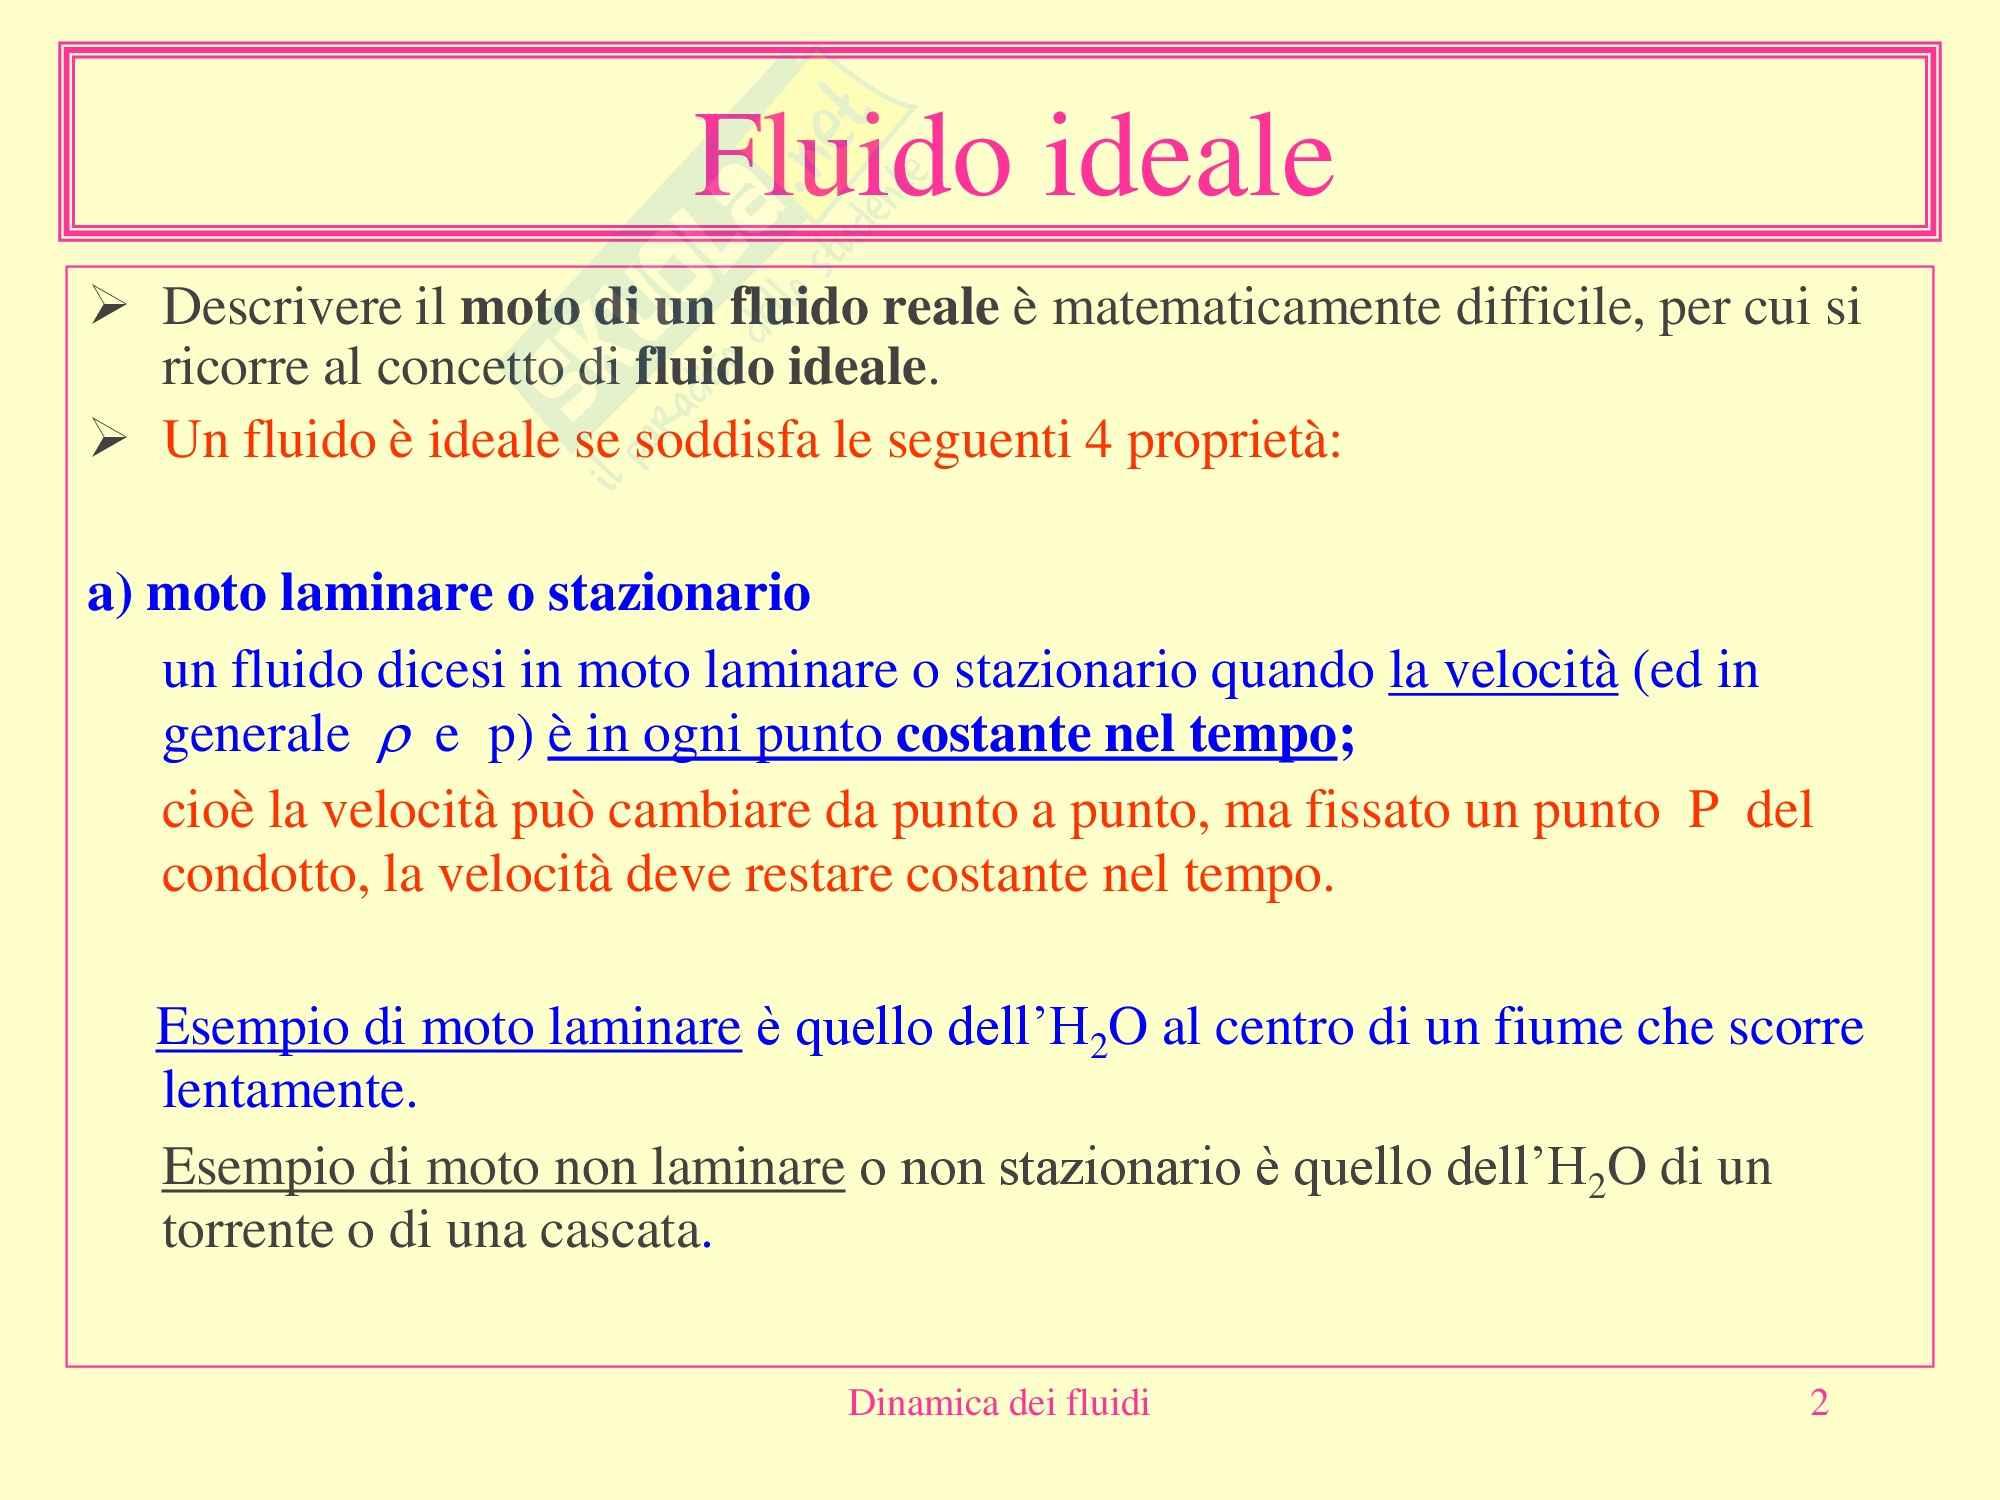 Fisica medica - dinamica dei fluidi Pag. 2